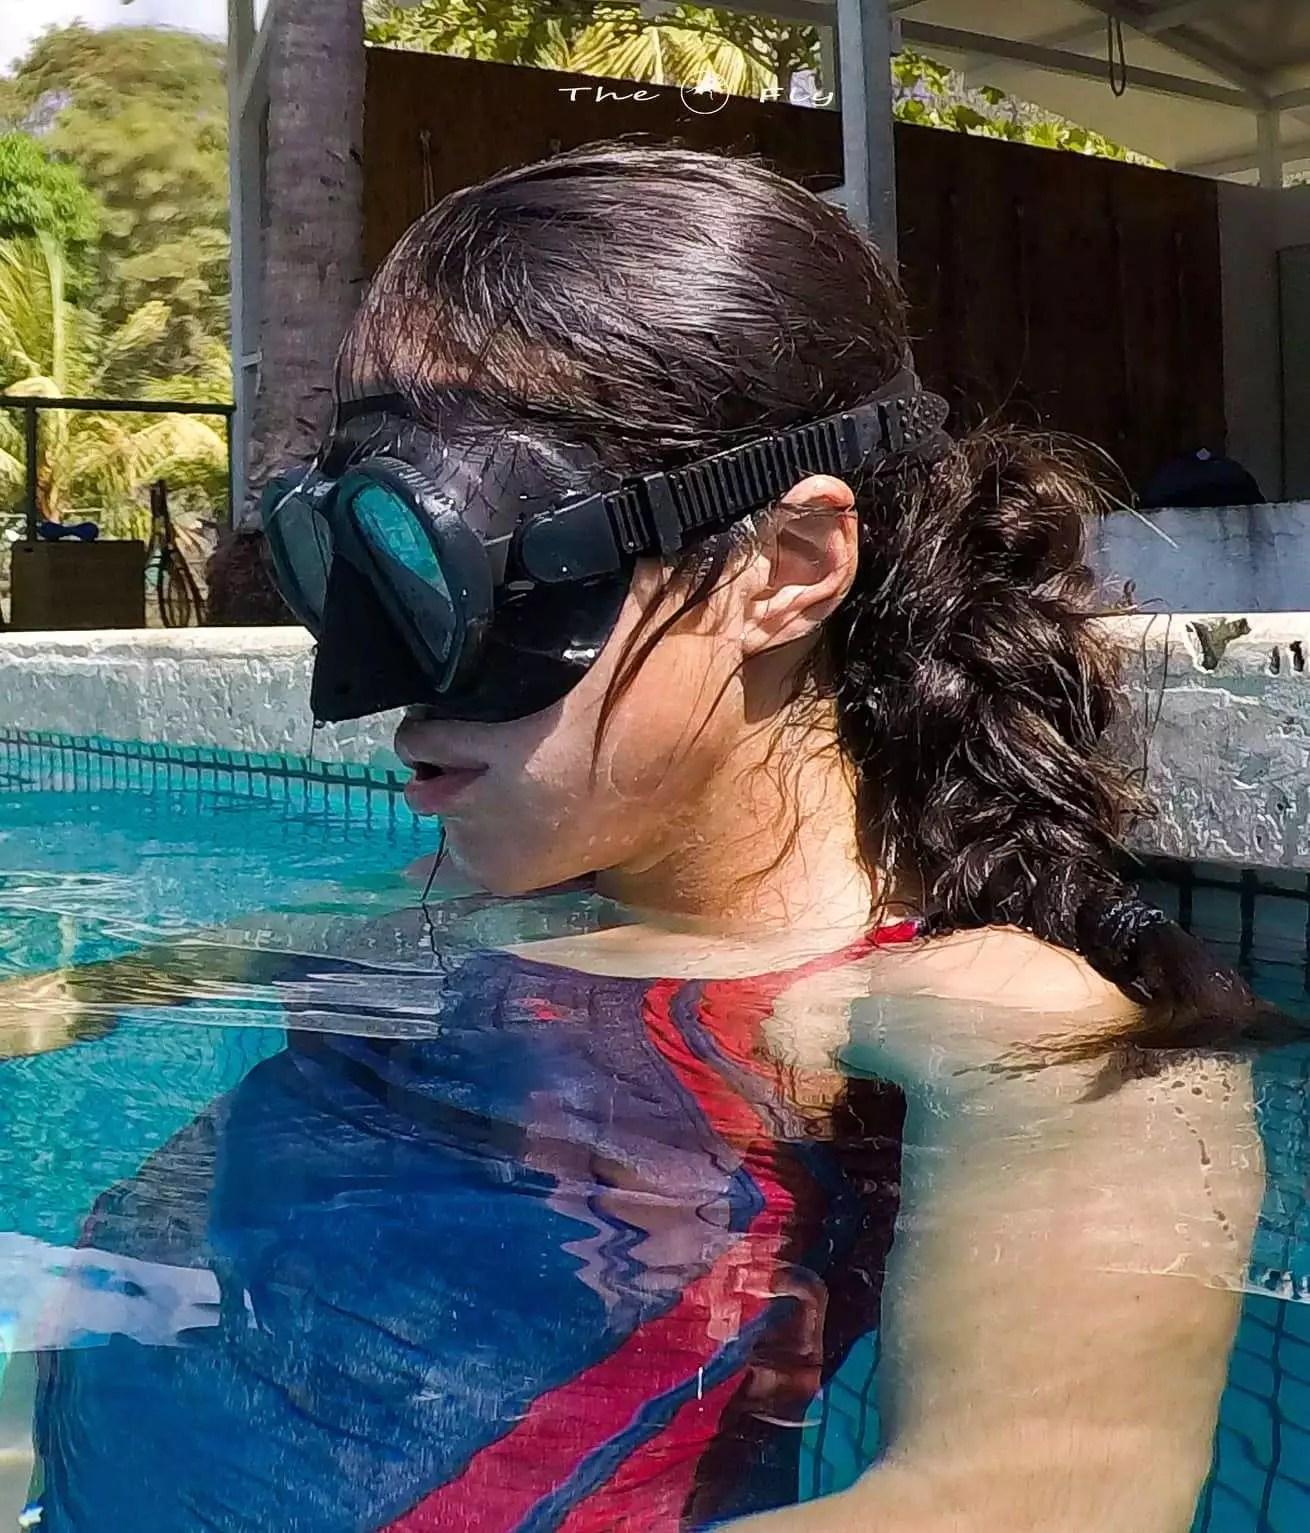 curso de freediving en costa rica